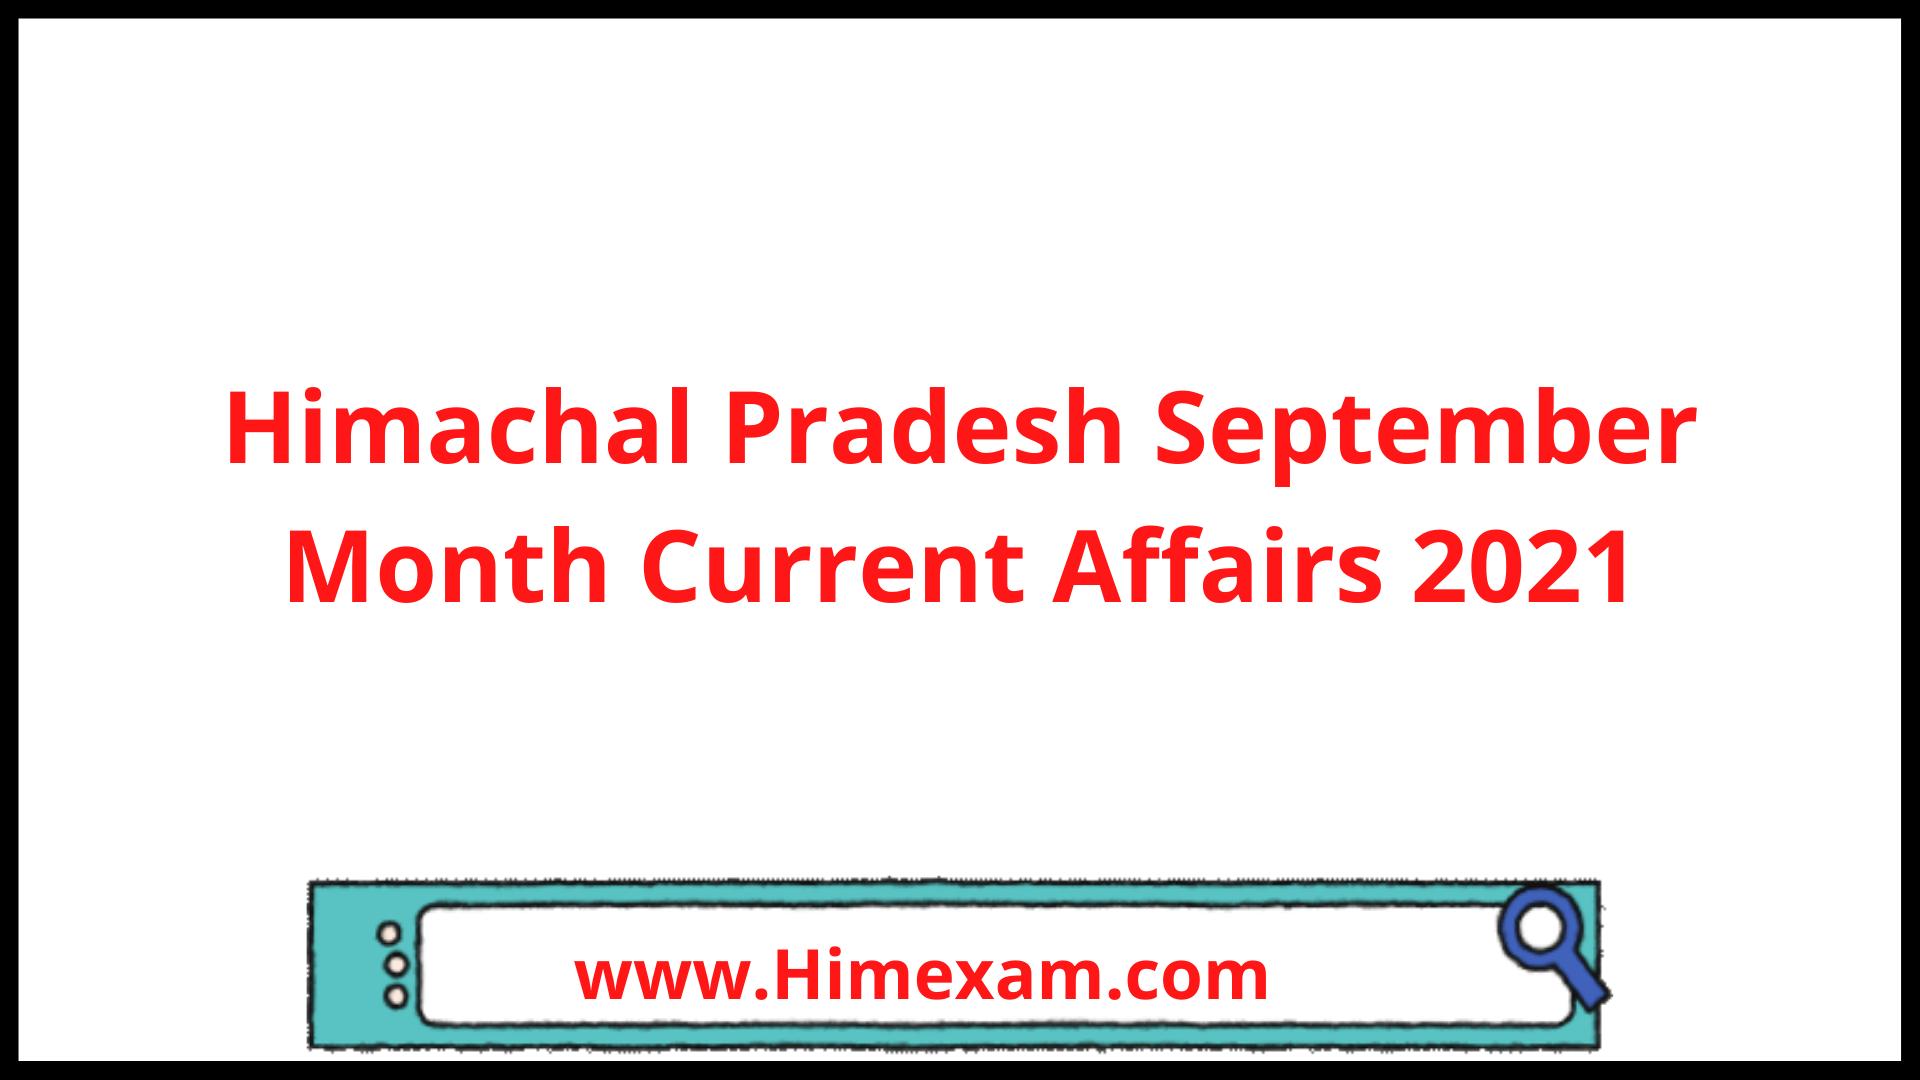 Himachal Pradesh September Month Current Affairs 2021